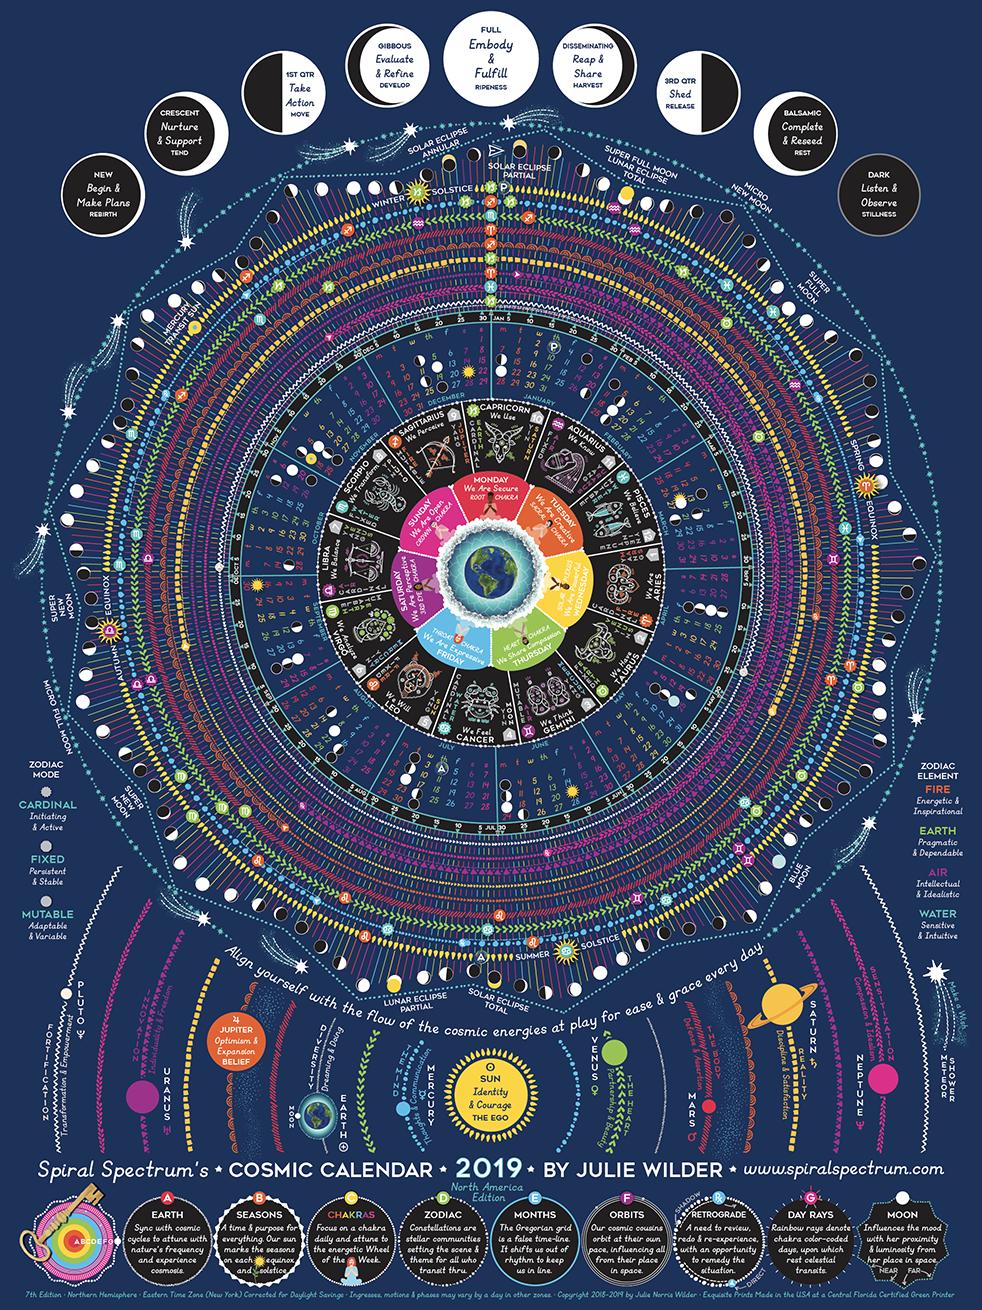 15df108d2 2019 Cosmic Calendar Cosmic Calendar, Moon Calendar, Astrology Calendar,  2018 Astrology, Astrology